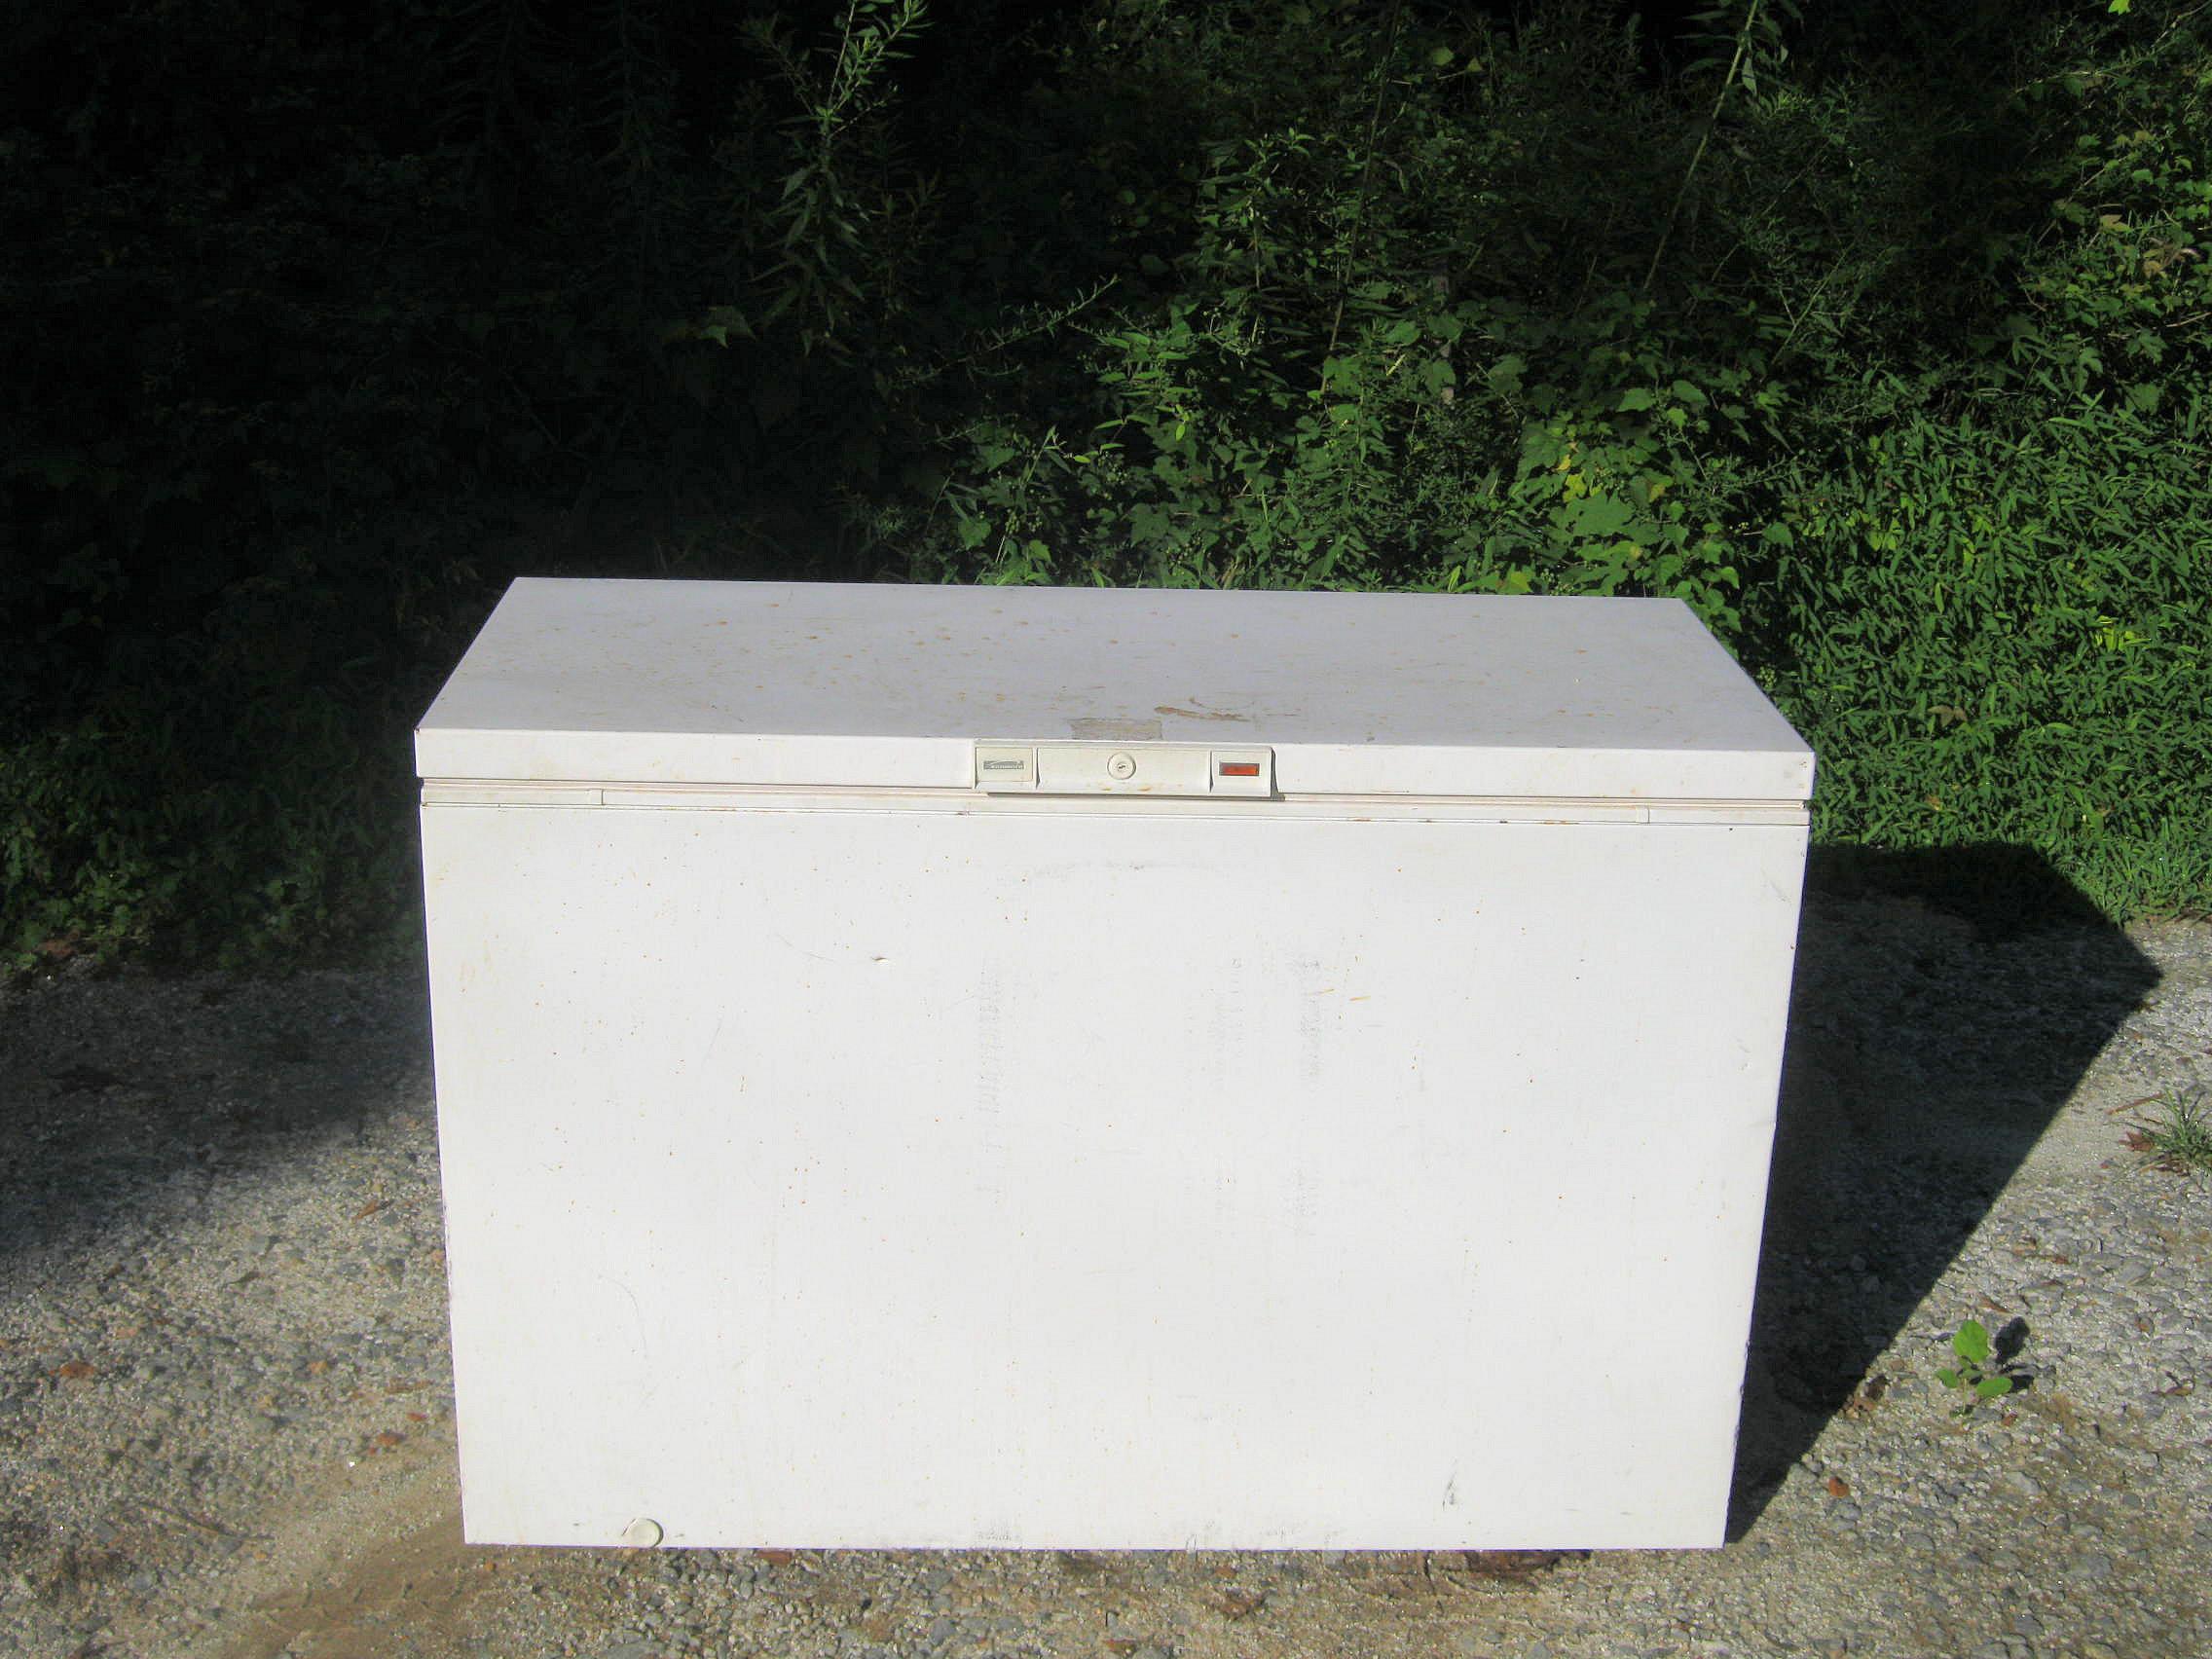 Chest Freezer Removal Atlanta By Boss Haul .Com